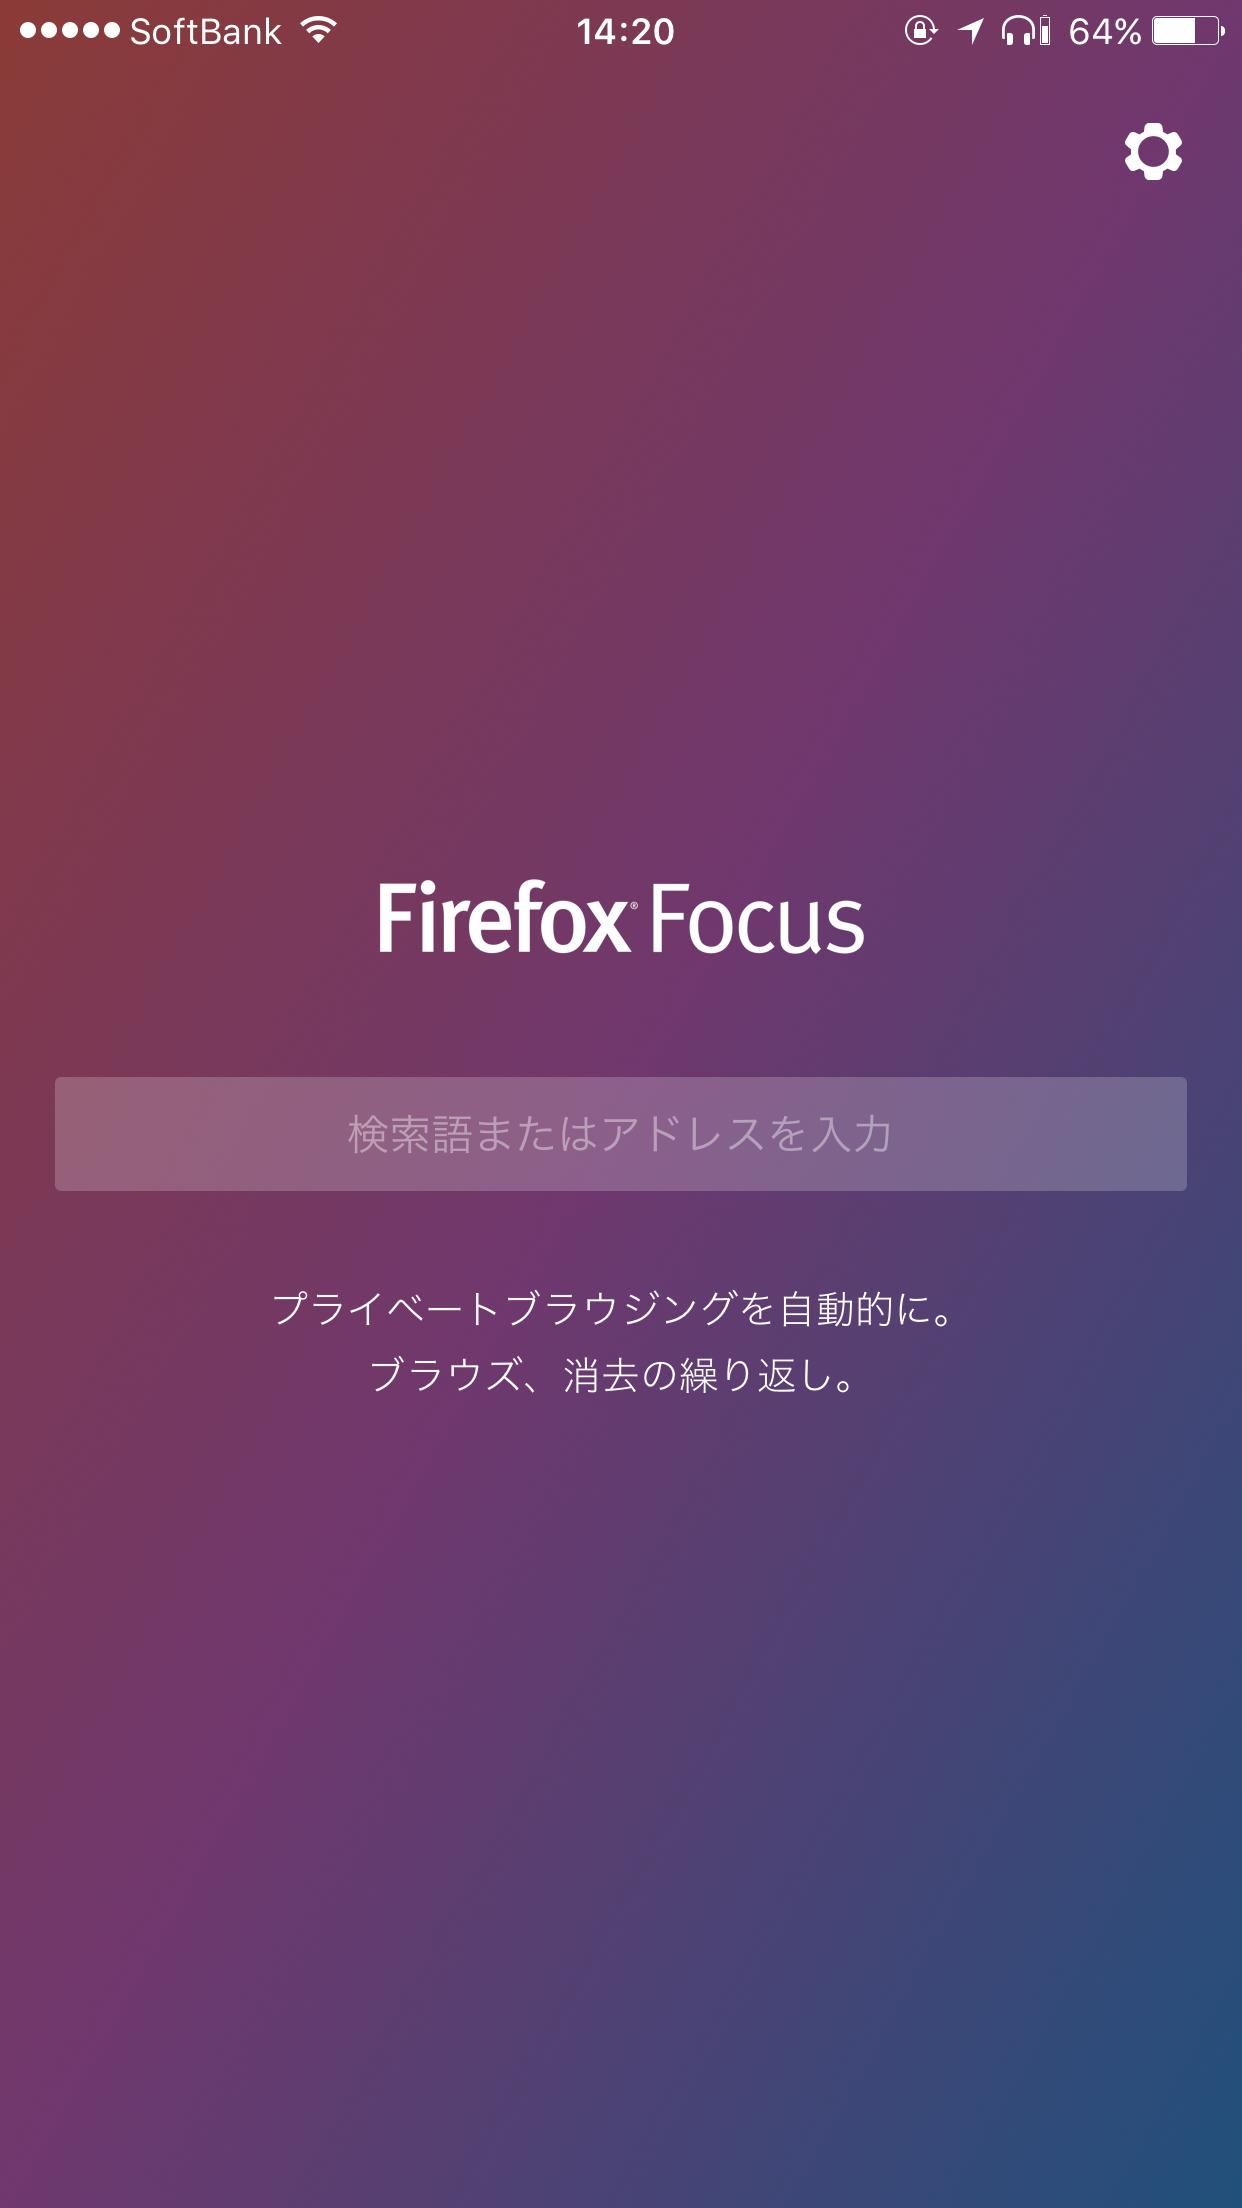 「Firefox Focus」のホーム画面